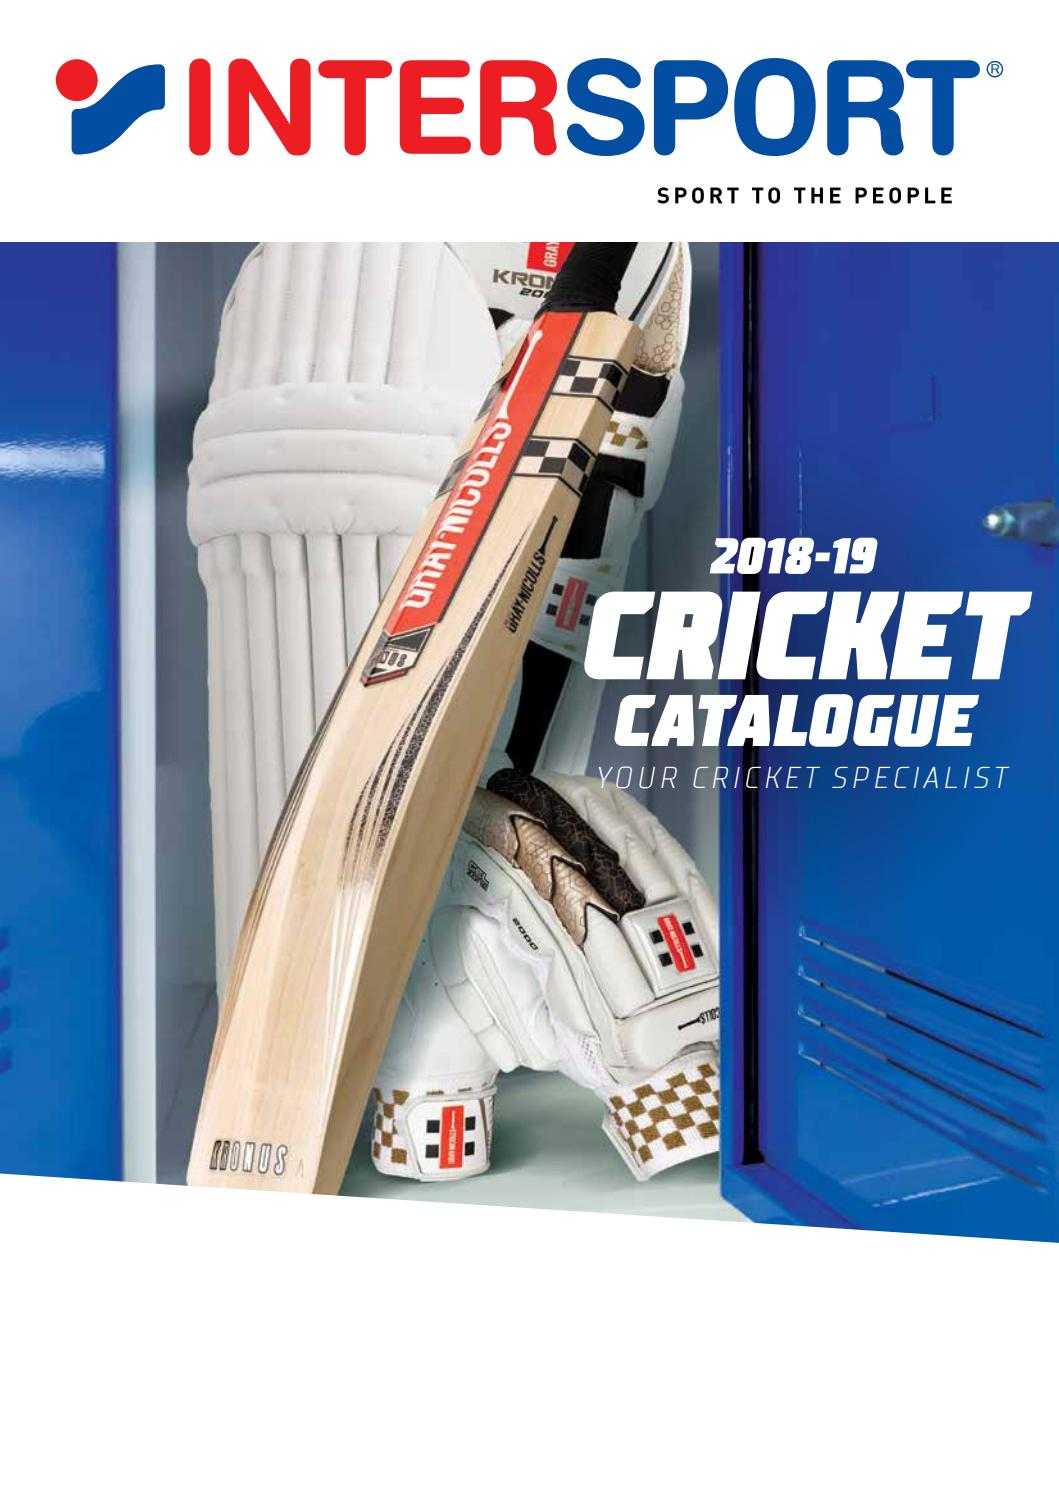 Boys Only Cricket 2018 Kookaburra 1000 Arm Guard Size Adults Junior